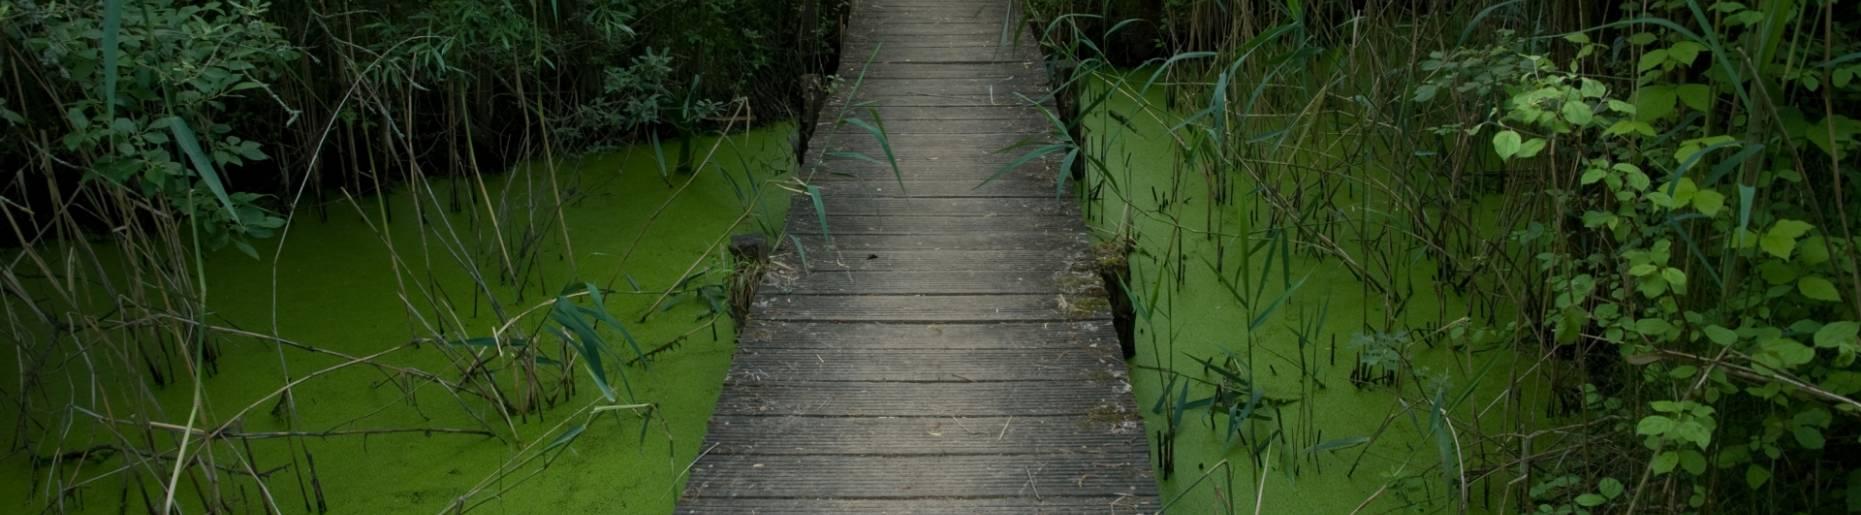 biodiversum natuurreservaat haff reimech